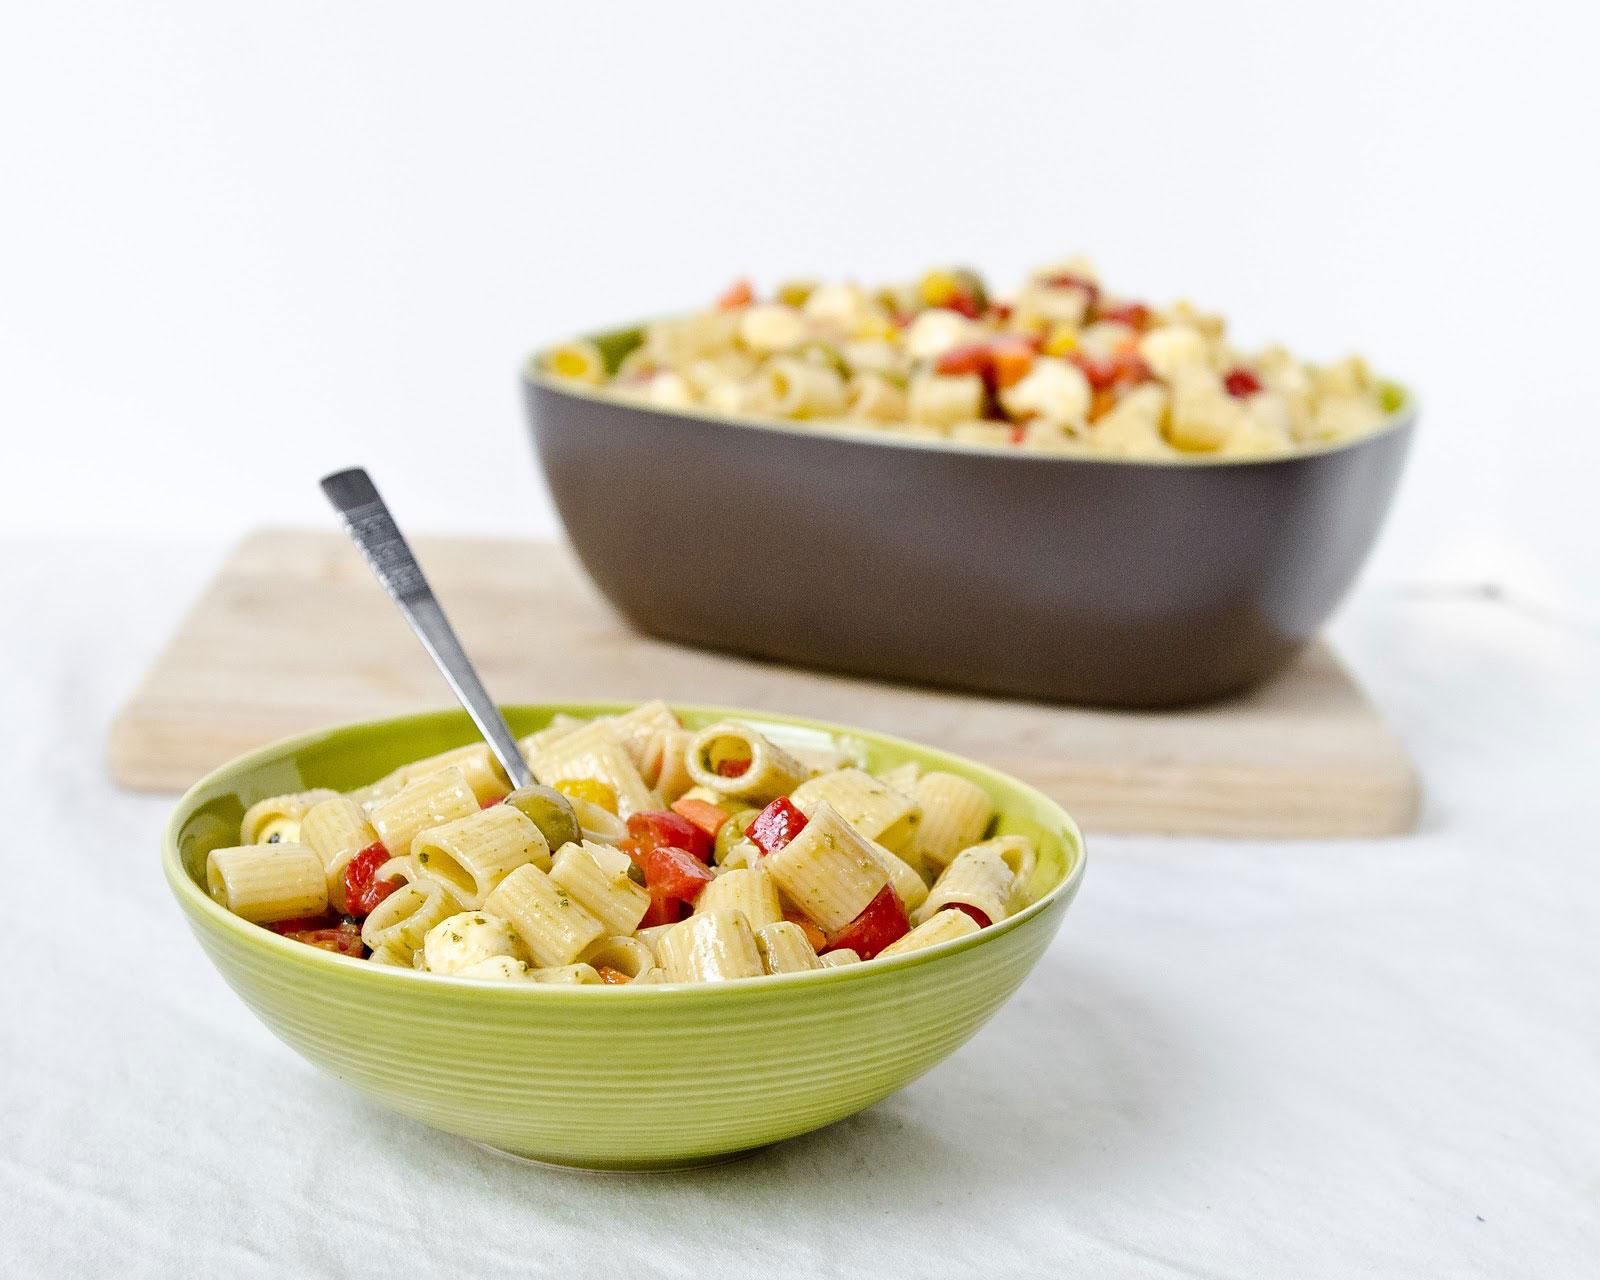 thefigtreeblog - vejetaryen yemekler